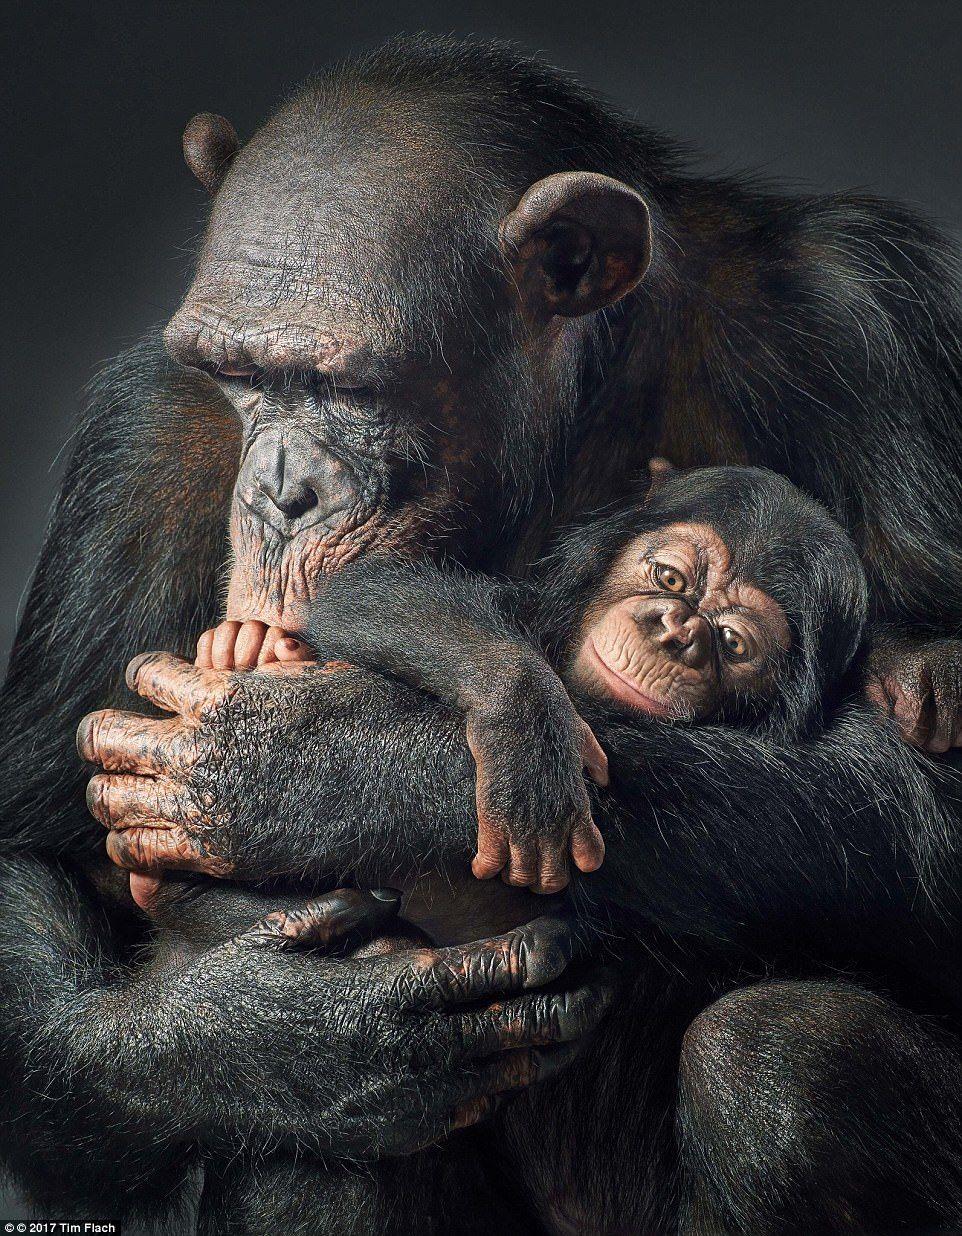 Stunning photo series highlighting endangered animals